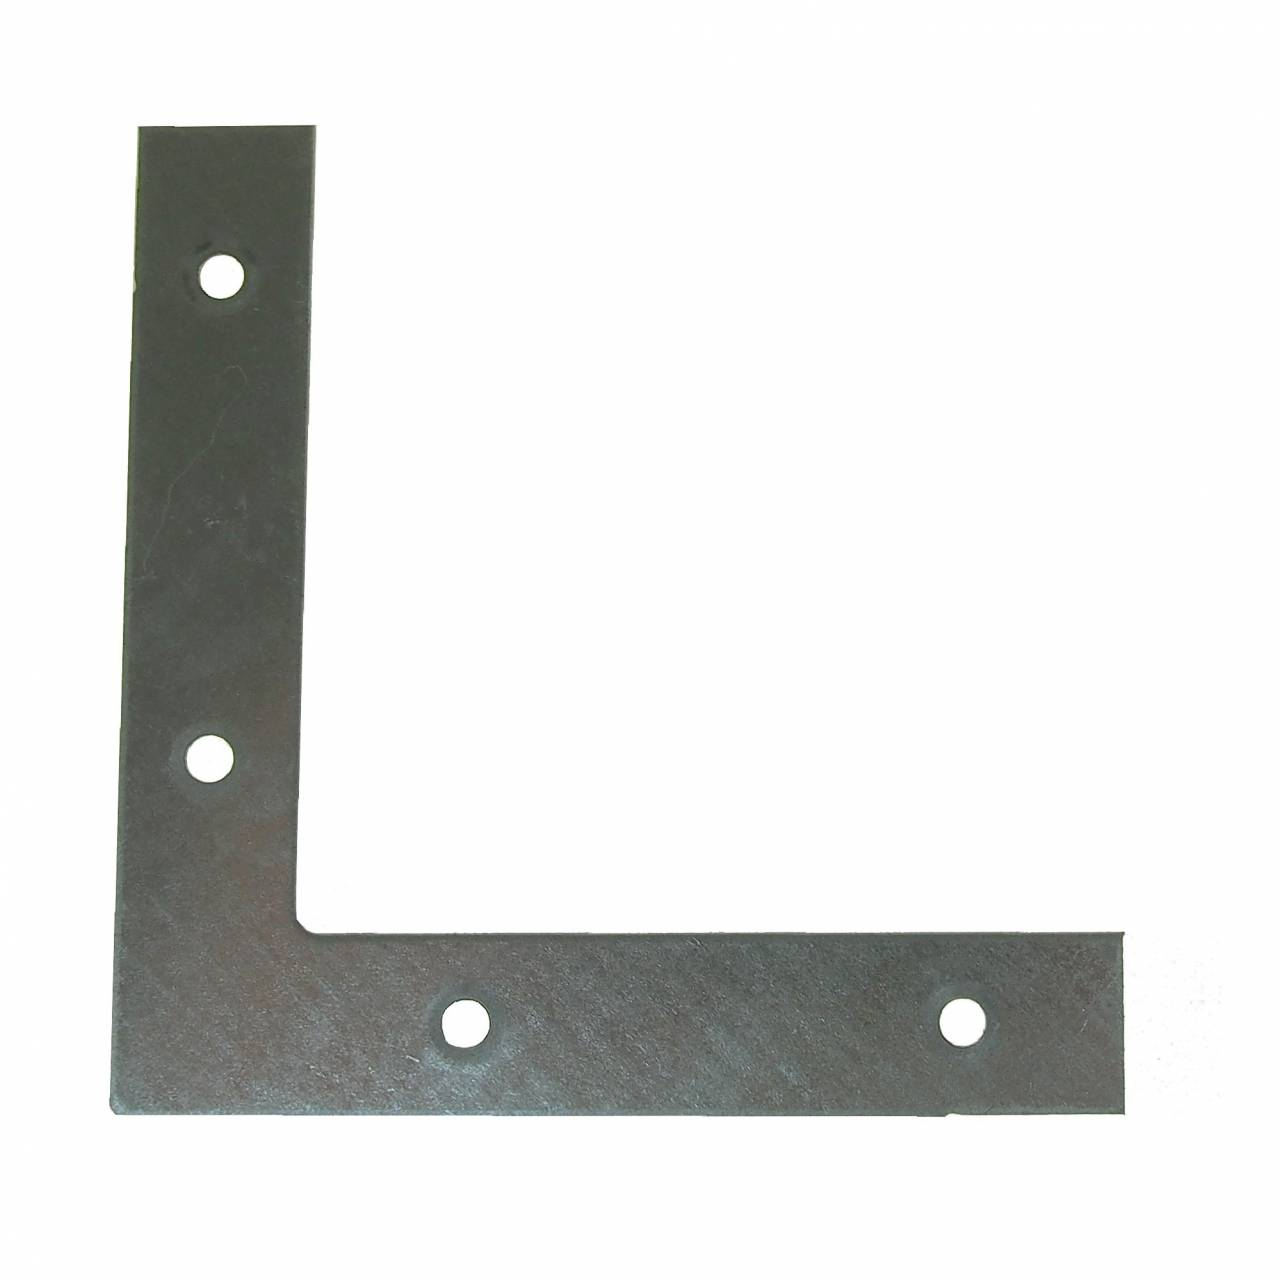 Flachwinkel vz 60 x 60 x 10 x 1,5 mm / Pck a 5 Stück